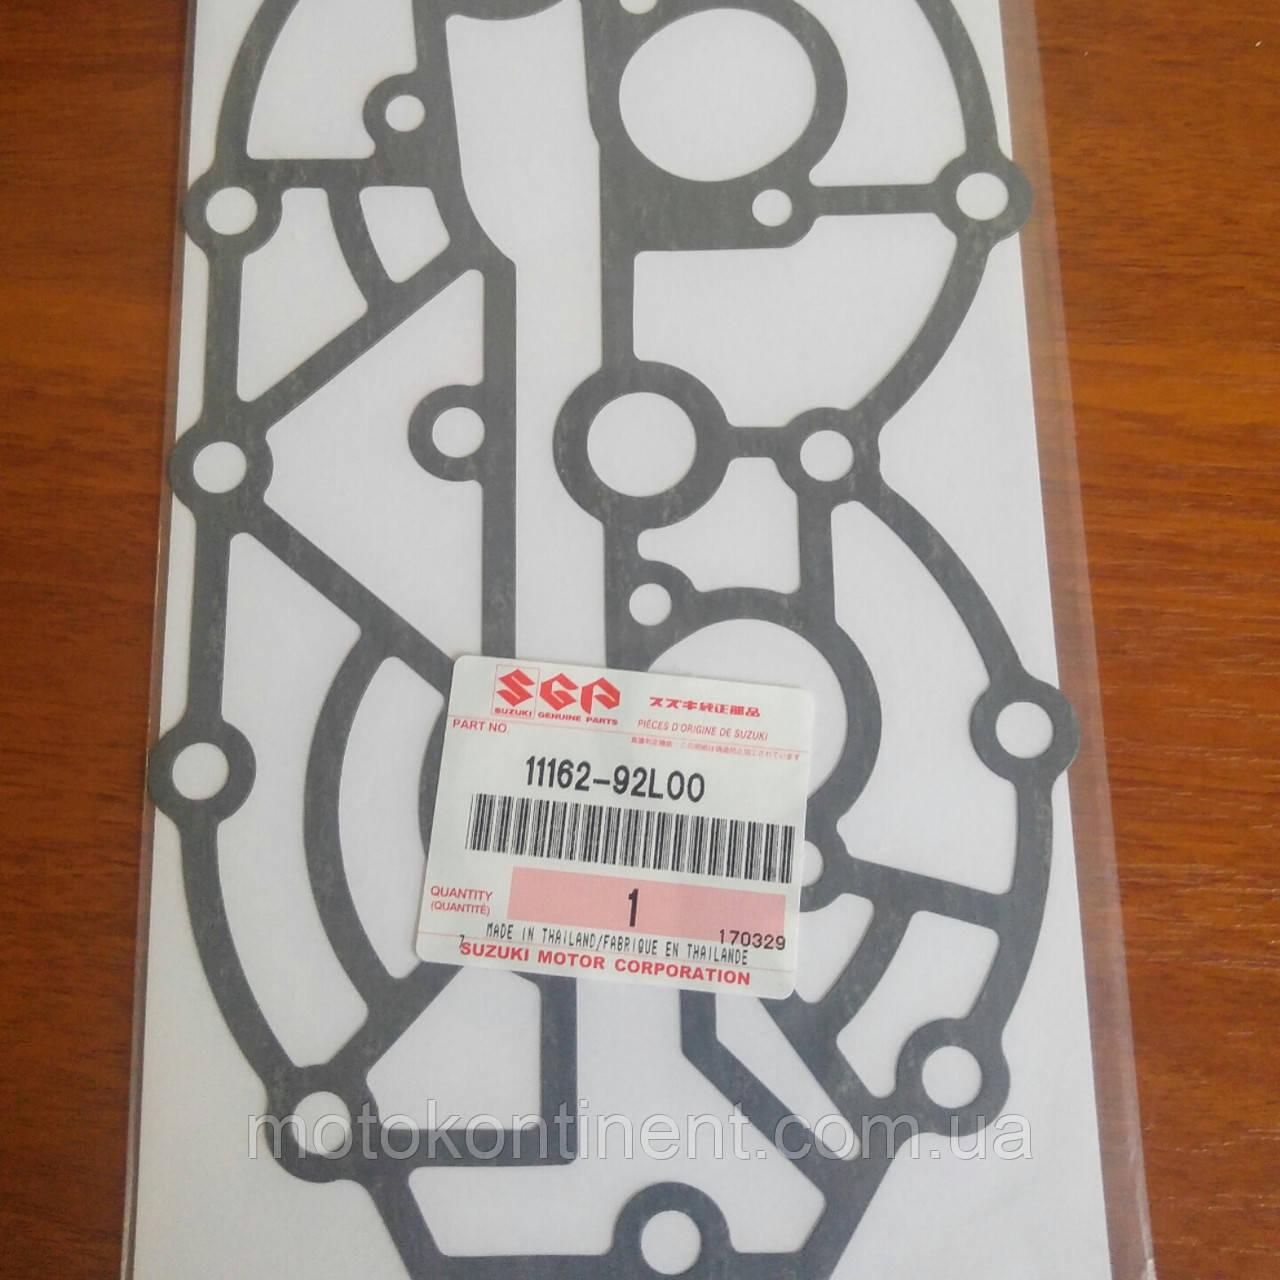 11162-92L00 Прокладка крышки головки блока цилиндров Suzuki DT40